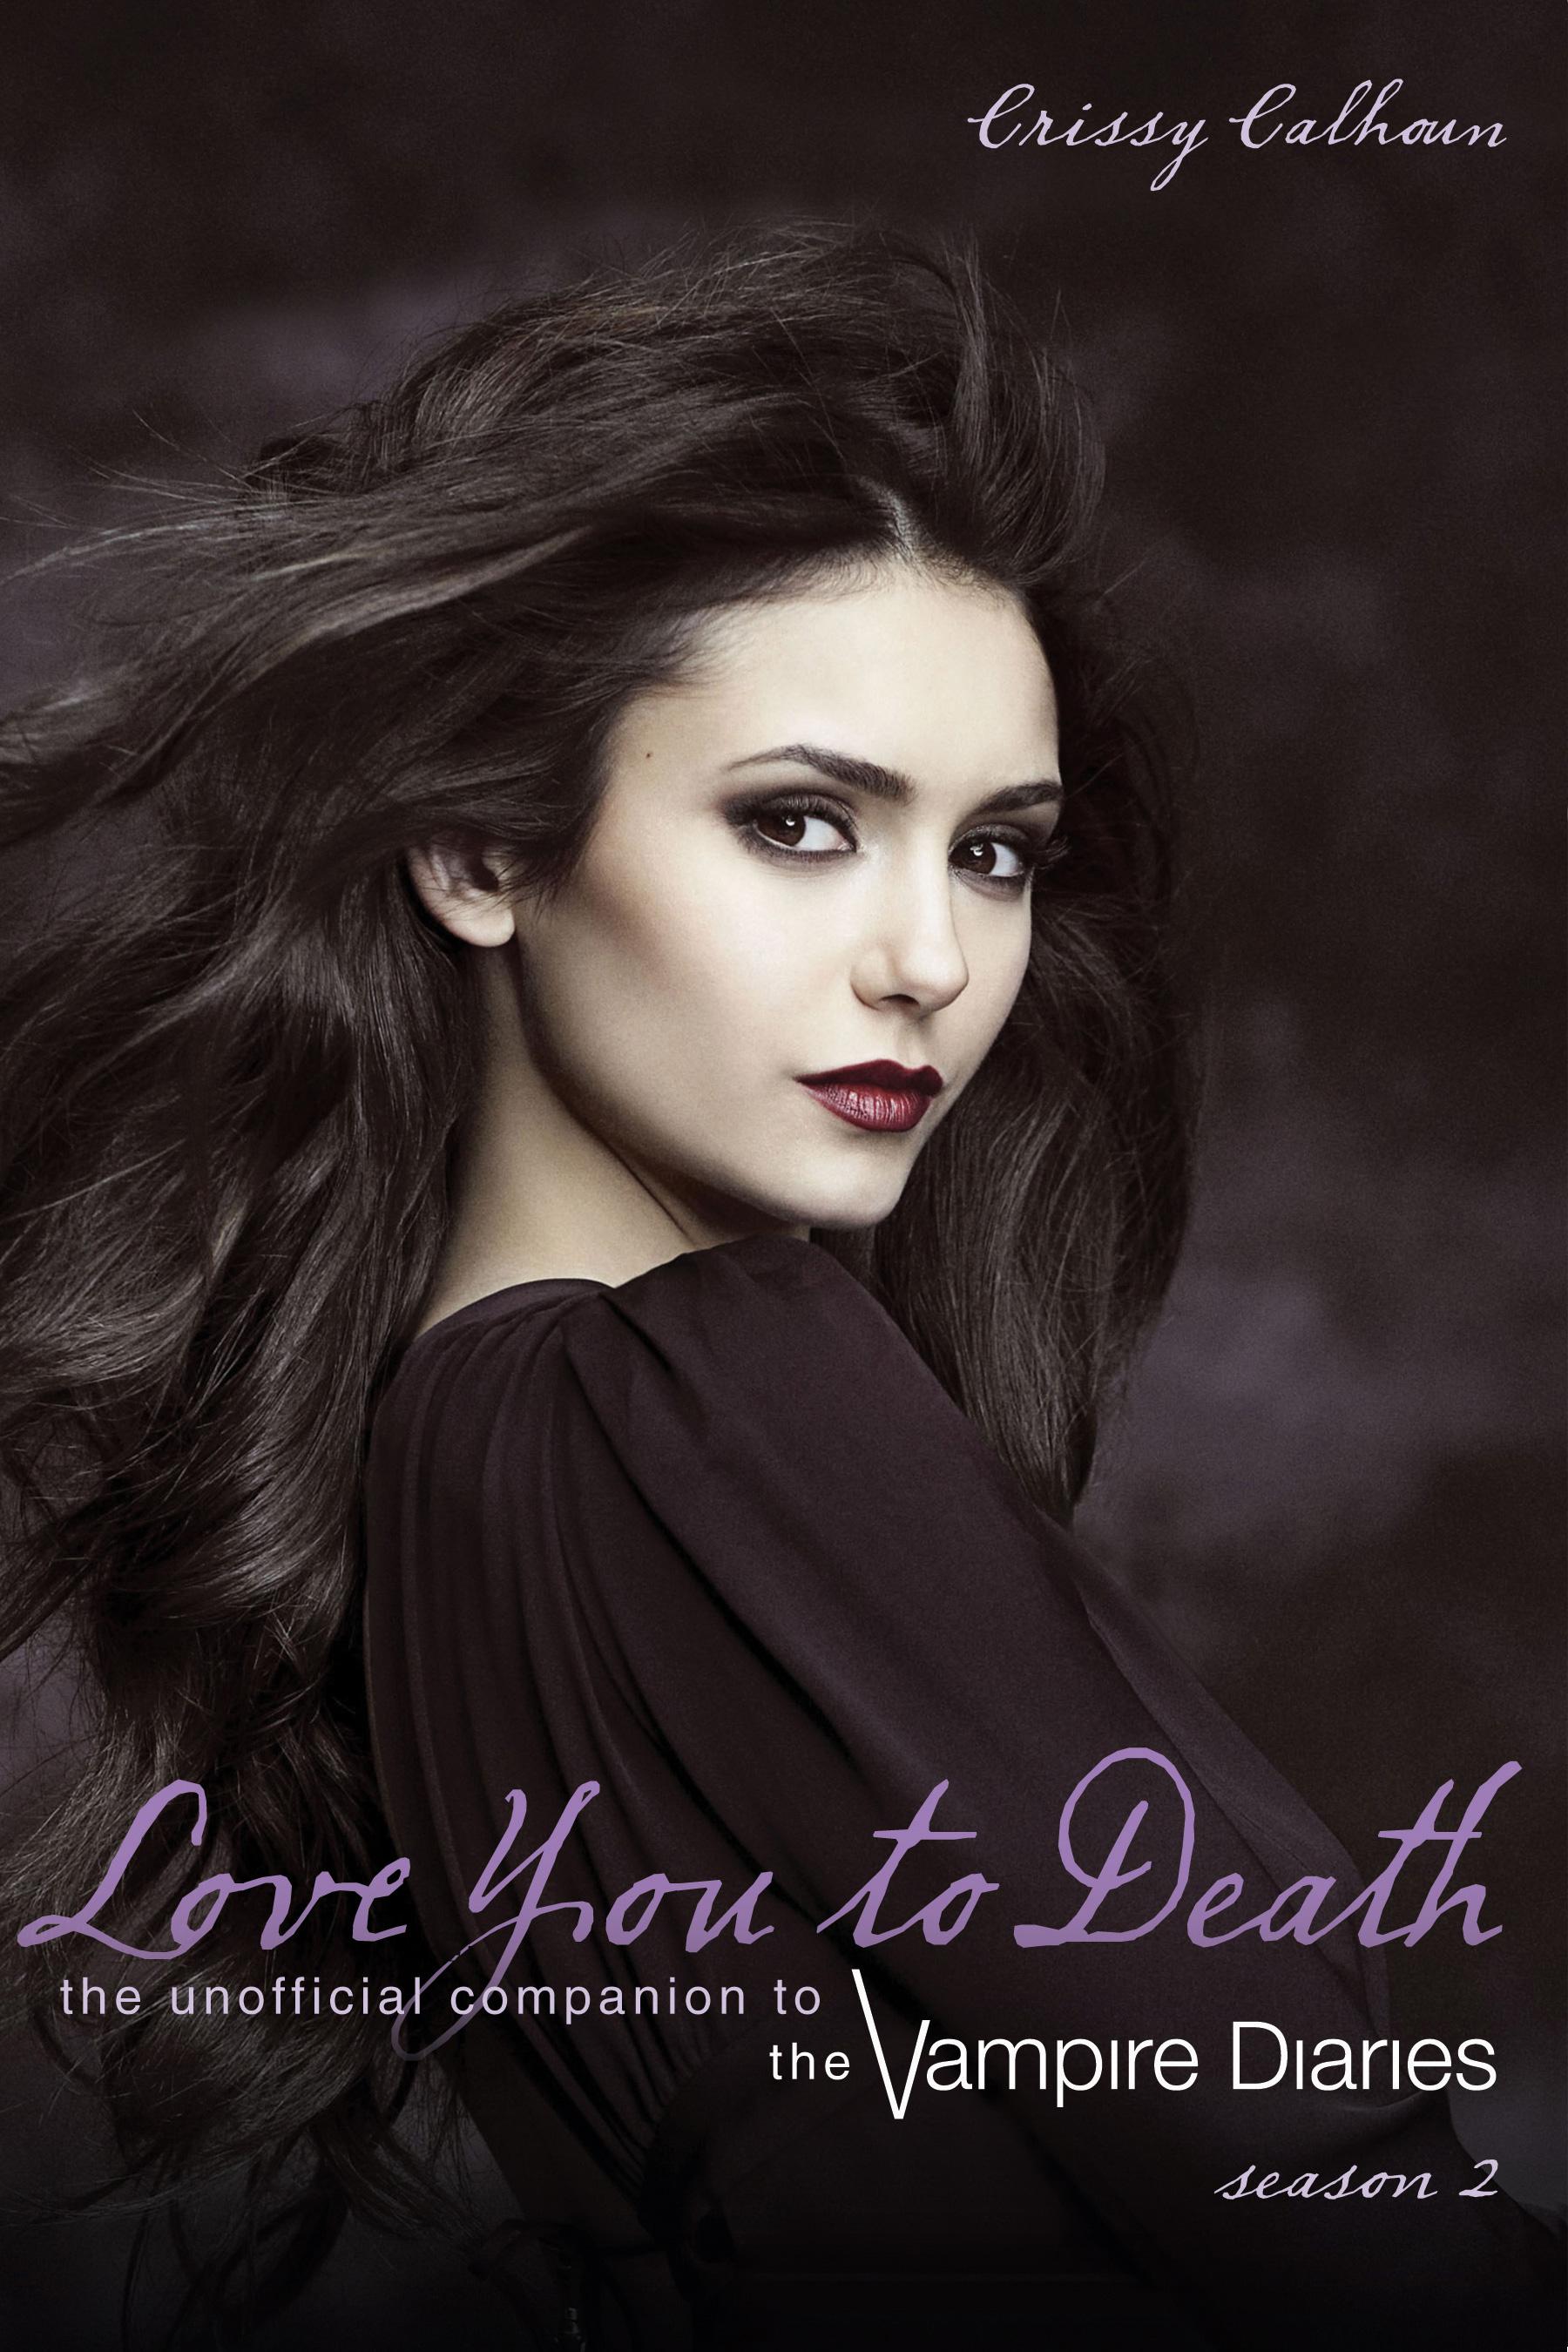 Book Cover Design Vampire : Love you to death season the vampire diaries wiki